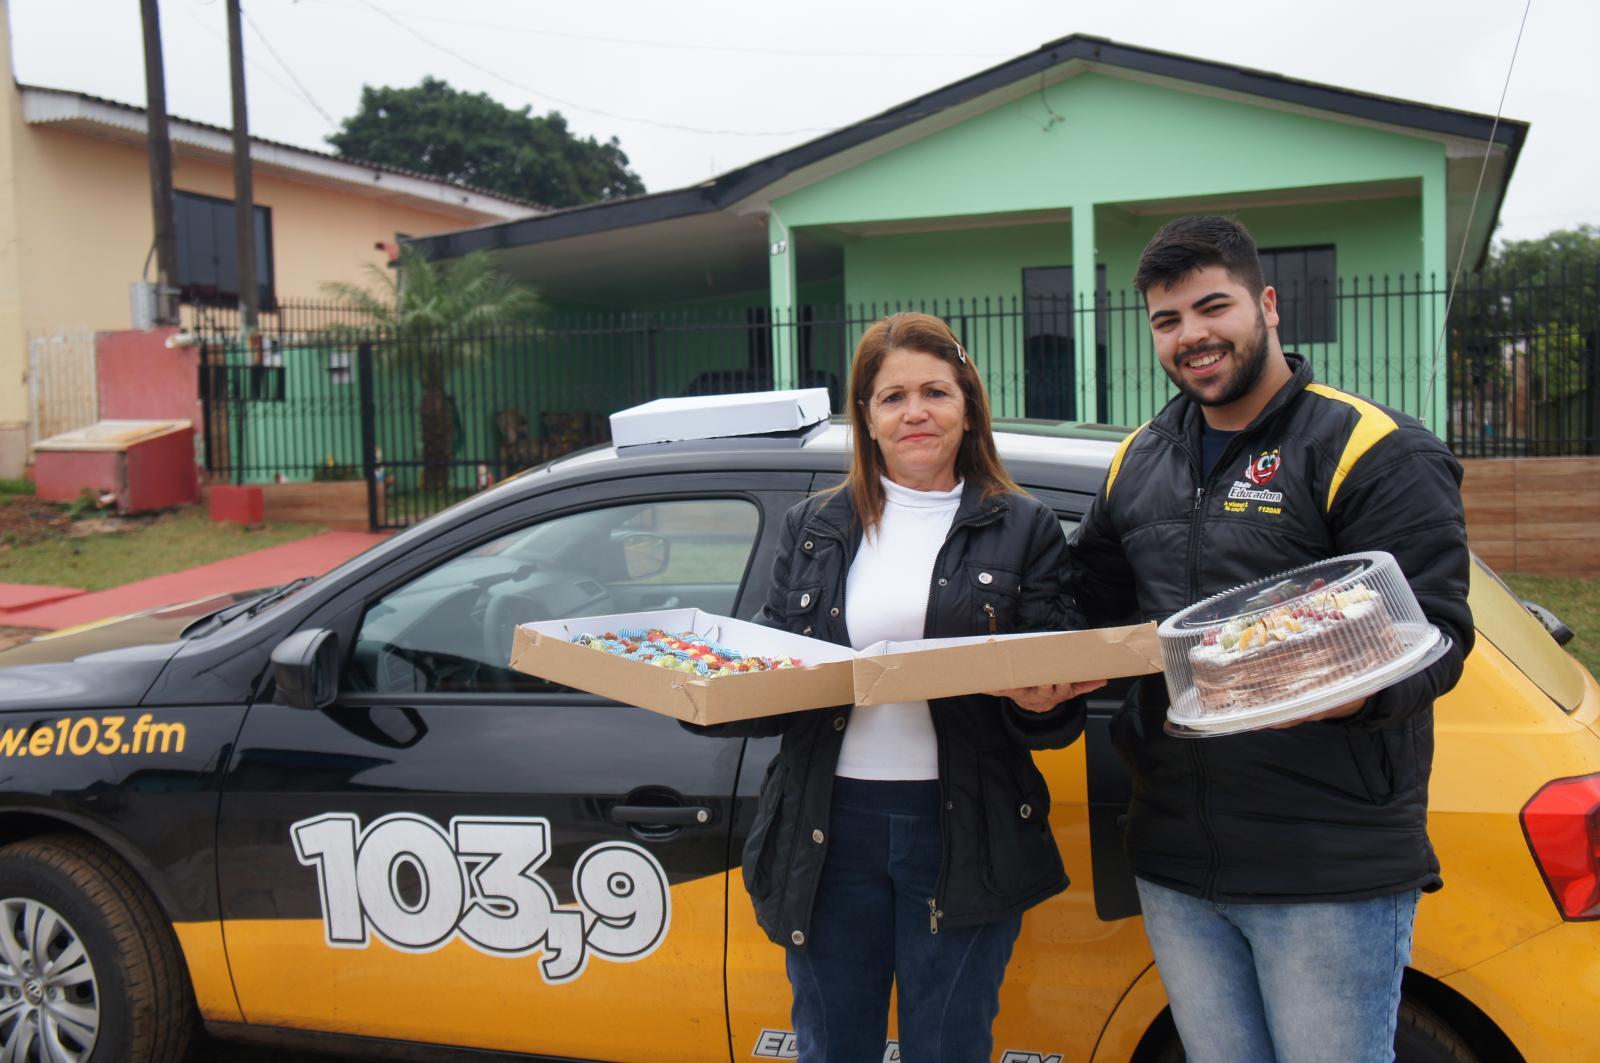 RADIO EDUCADORA CELEBRA O ANIVERSARIANTE DA SEMANA COM KITUTES DA MARI